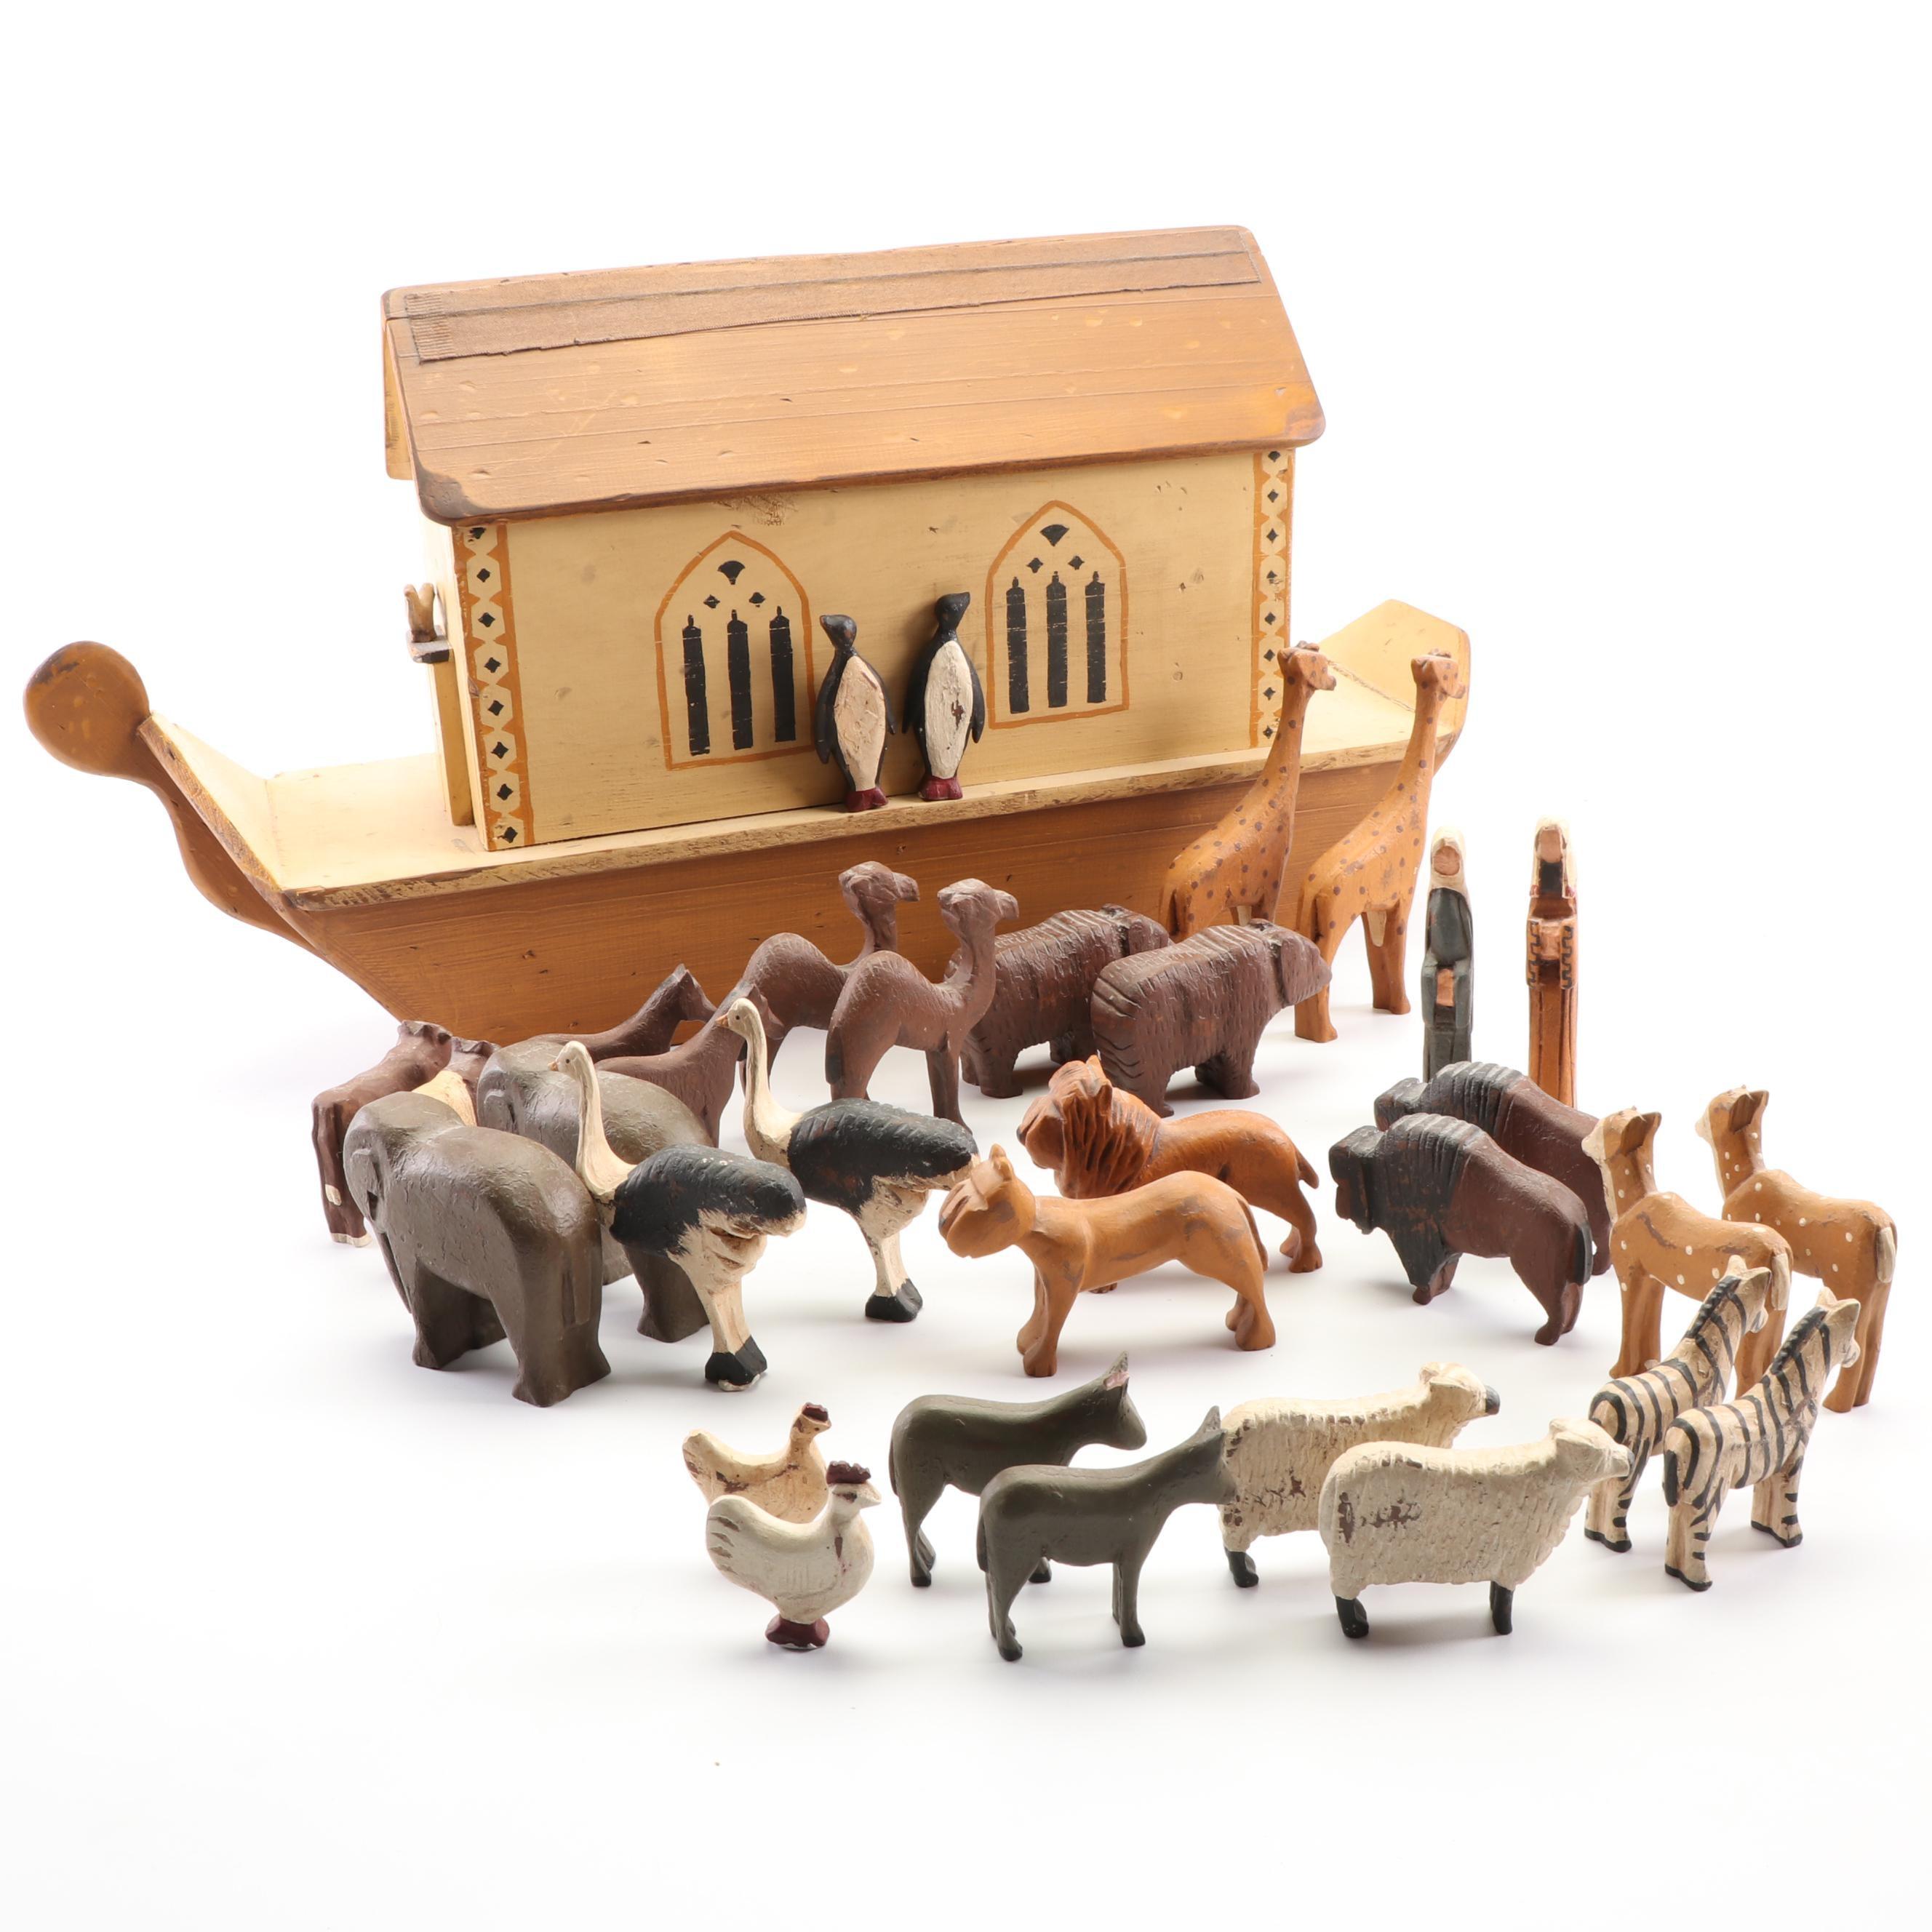 "Royston & Co. Painted Wood ""Noah's Ark"" Figurine Set, Late 20th Century"